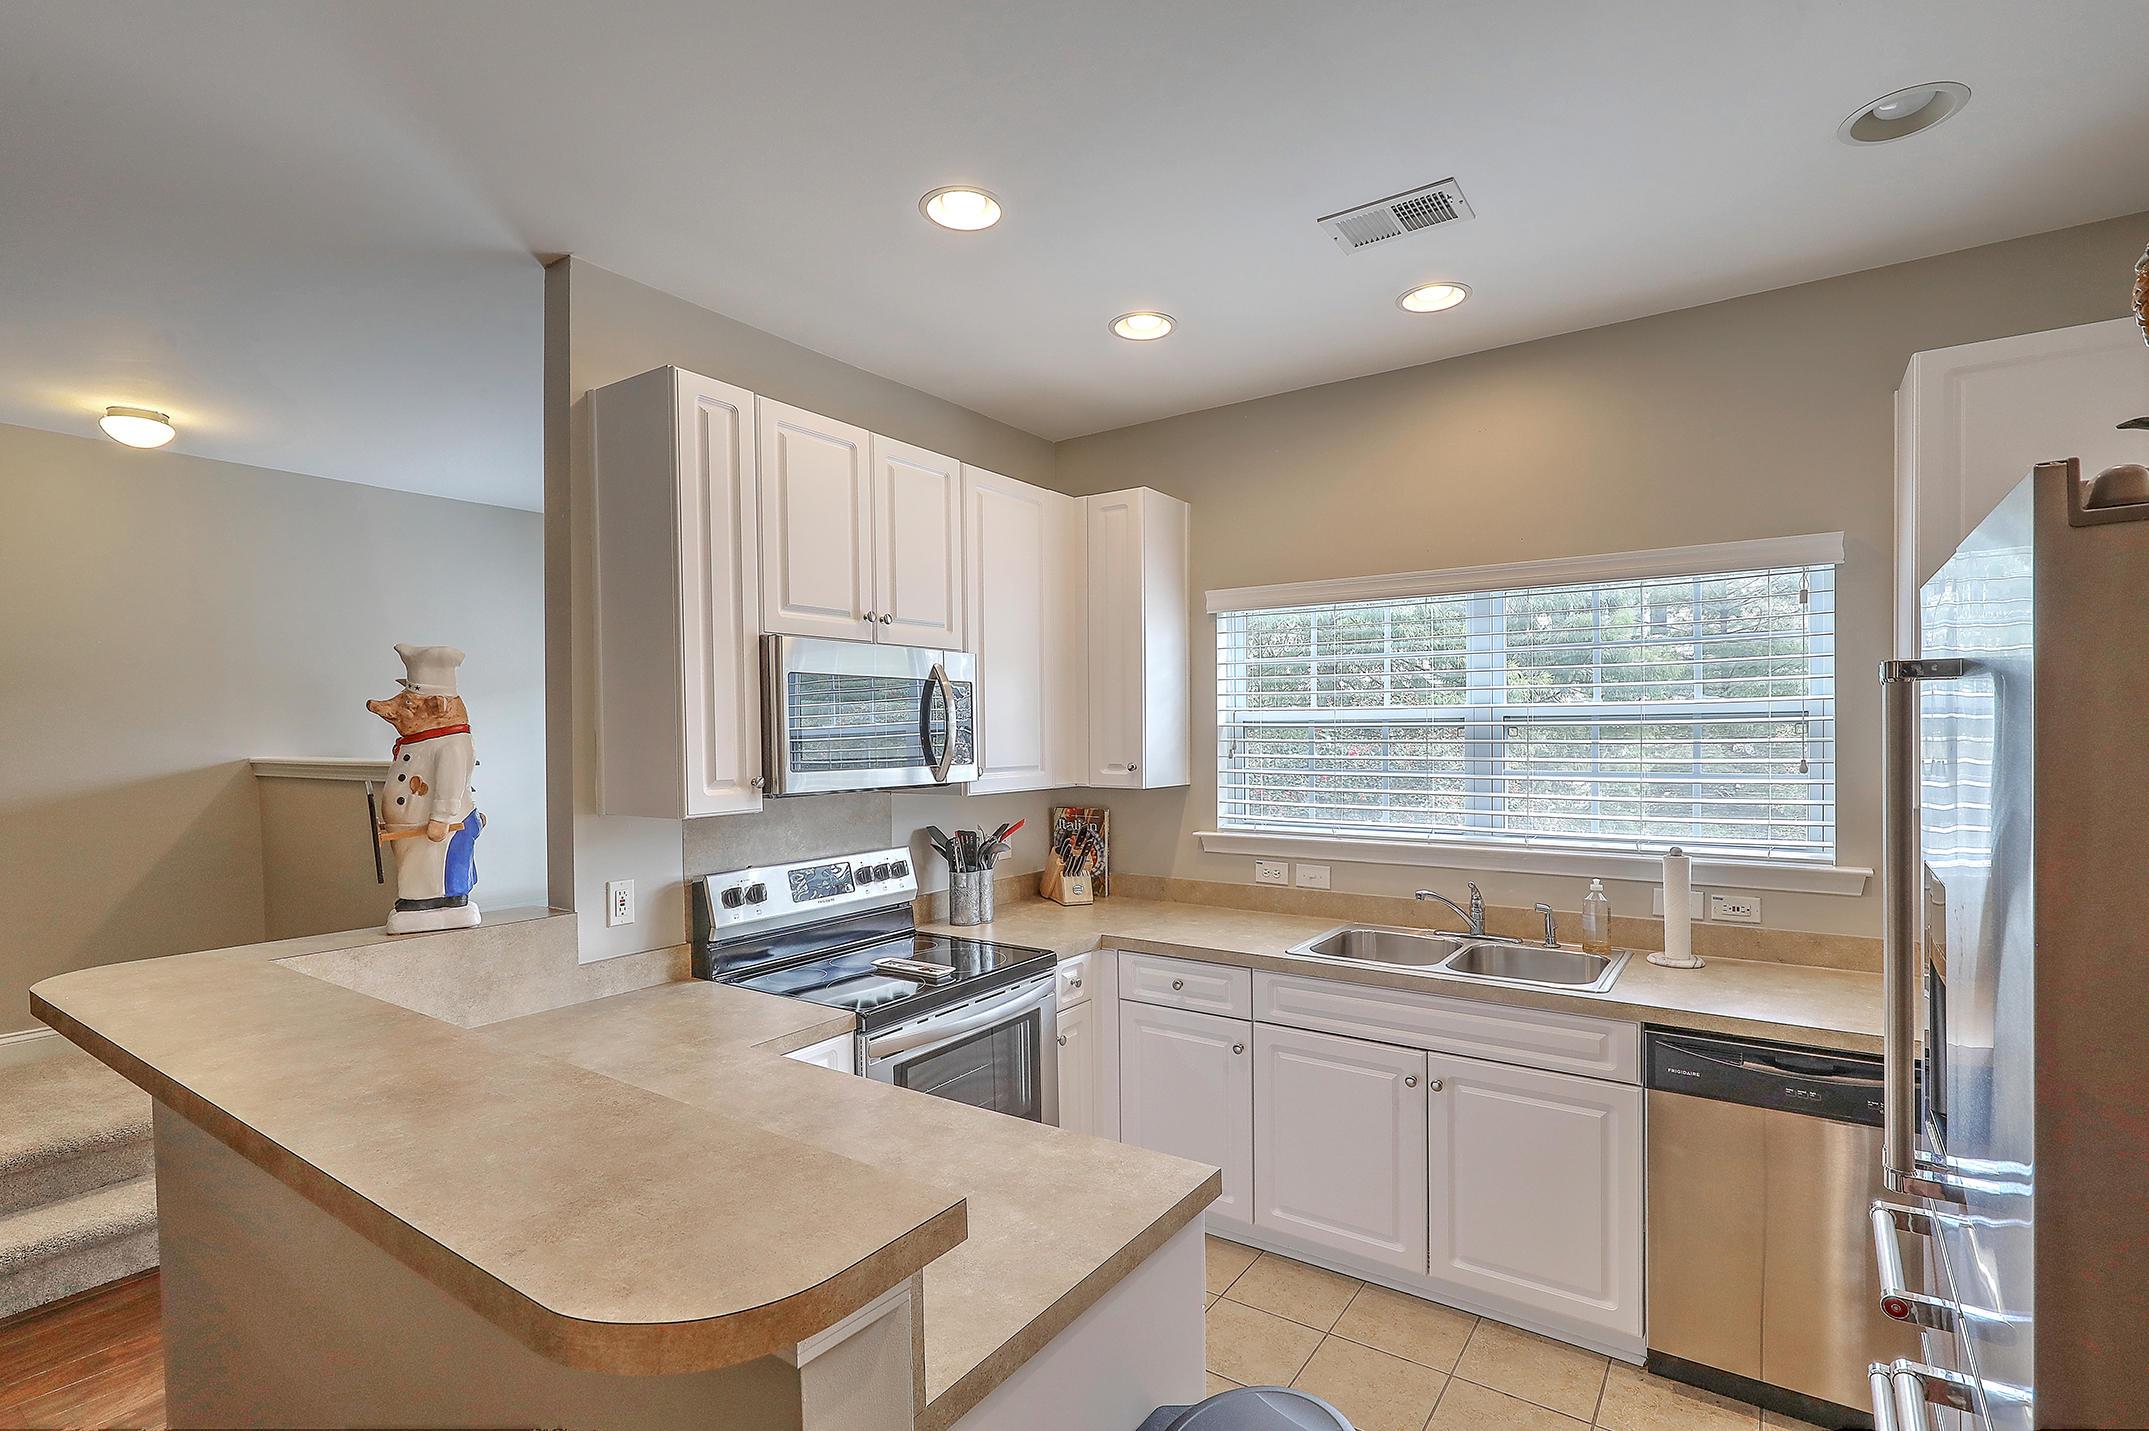 Ashley Park Homes For Sale - 4149 Perrine, Charleston, SC - 1